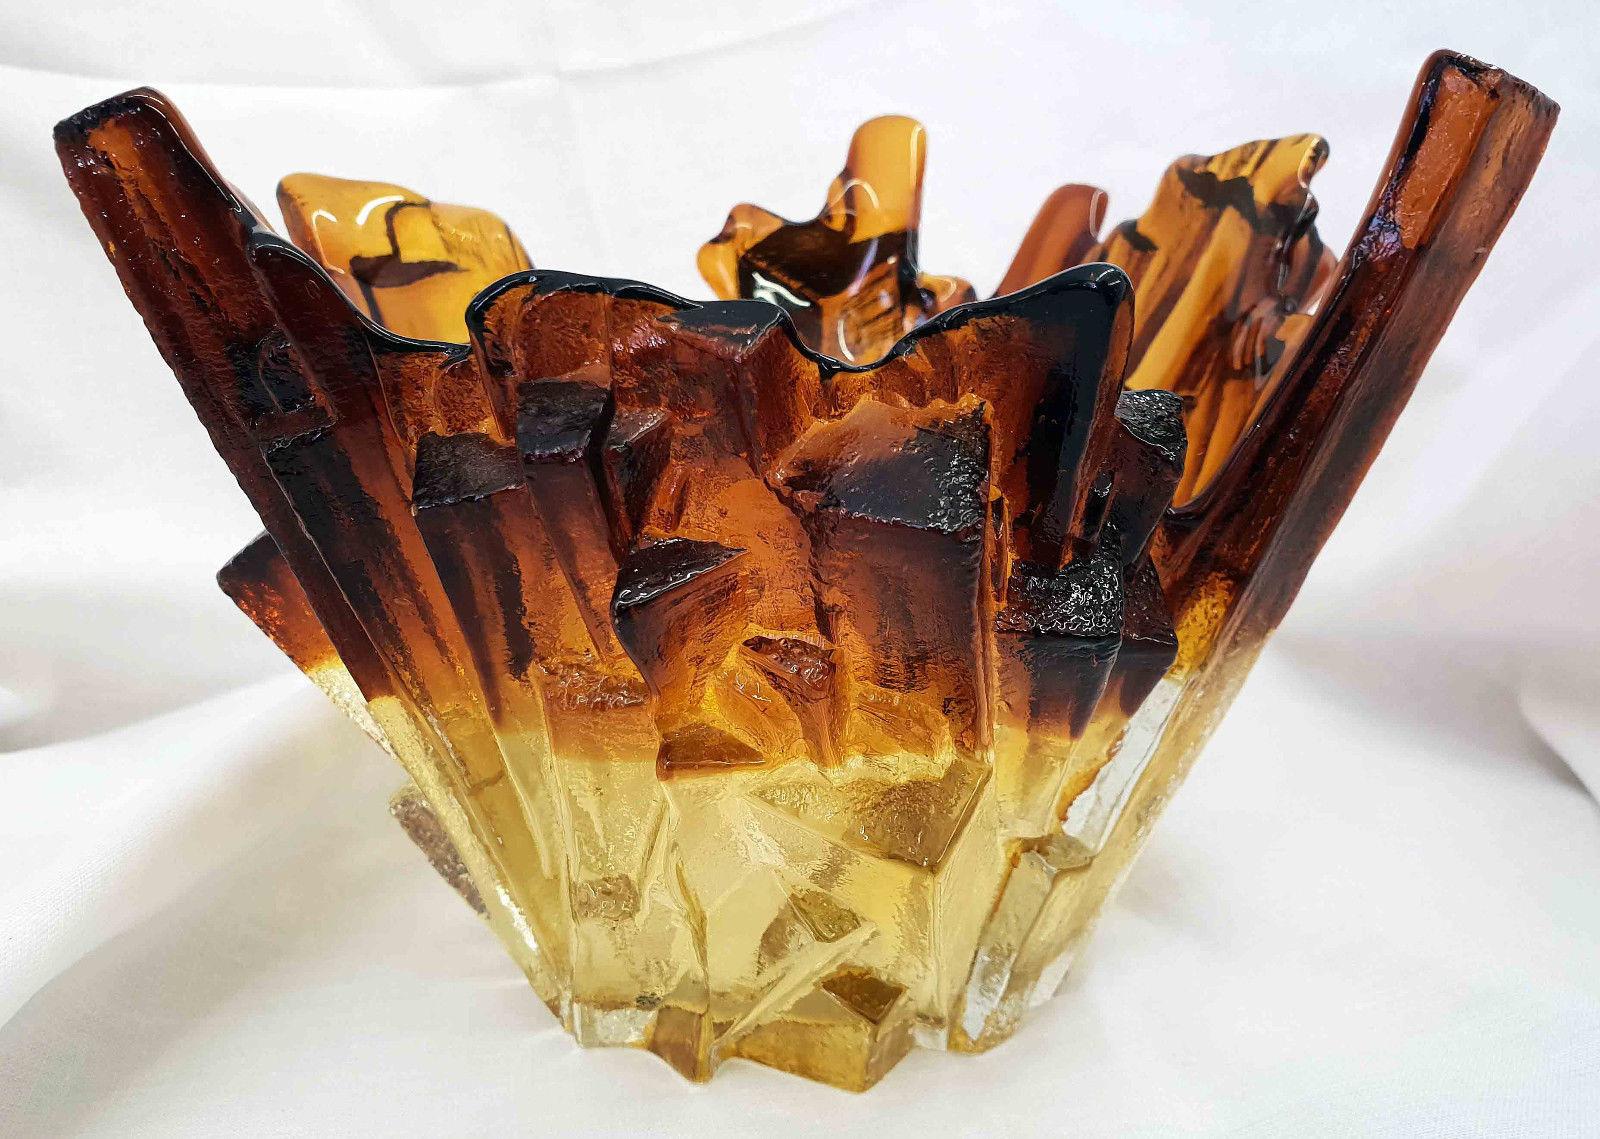 kosta boda vase orange of vase pertti santalahti humppila glaswerk finnland eur 12900 regarding 1 von 1 siehe mehr